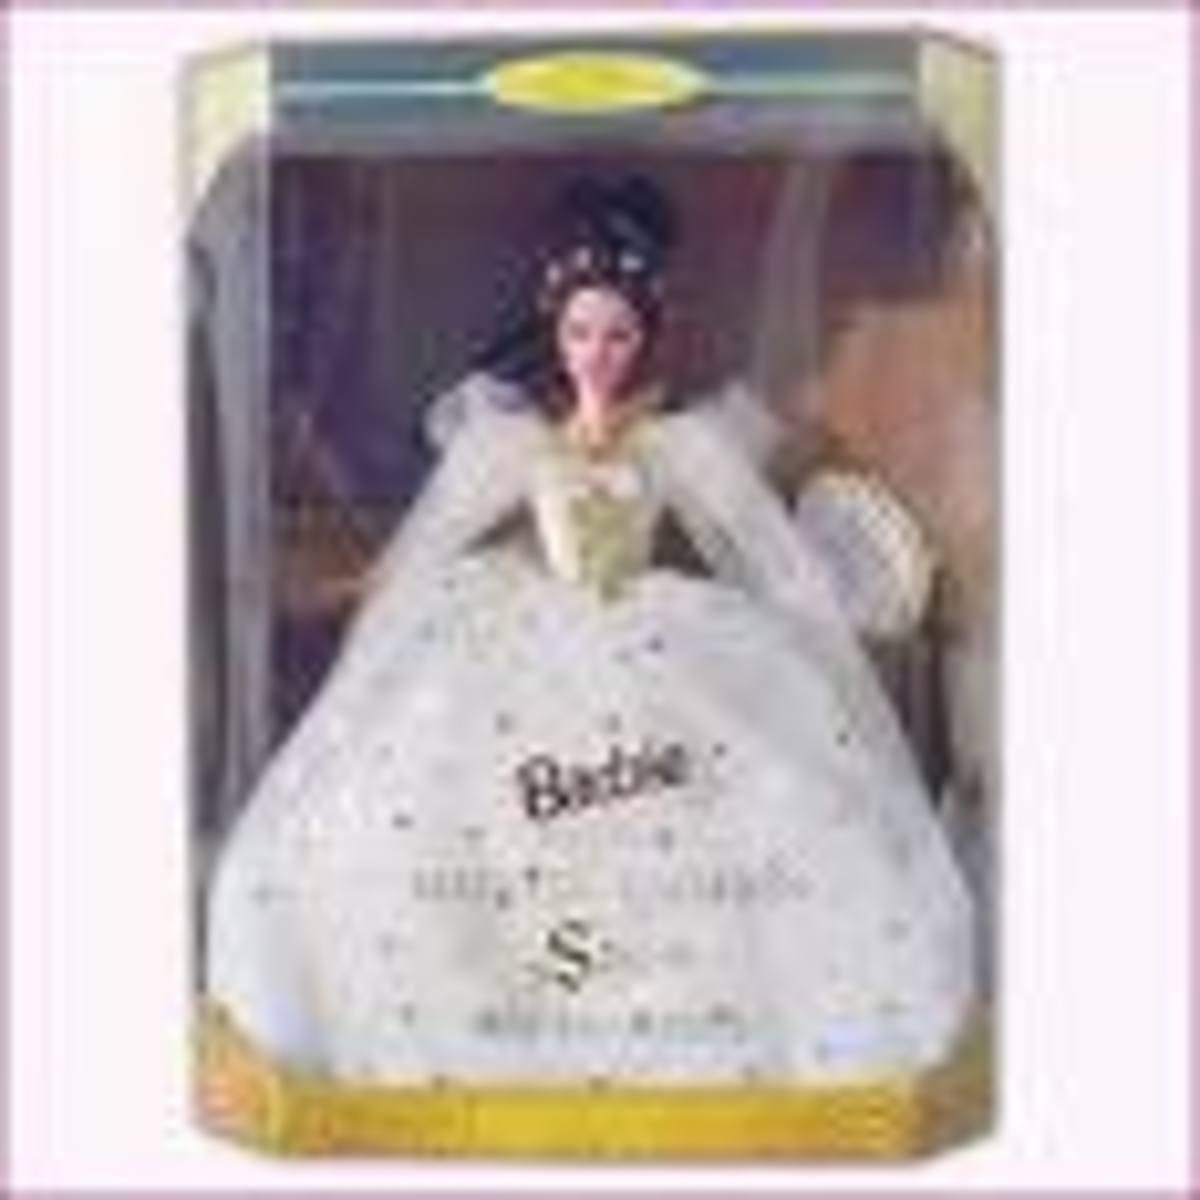 Empress Sissy Doll photo courtesy of raindowfactorydolls.com Celebrity Barbie Doll